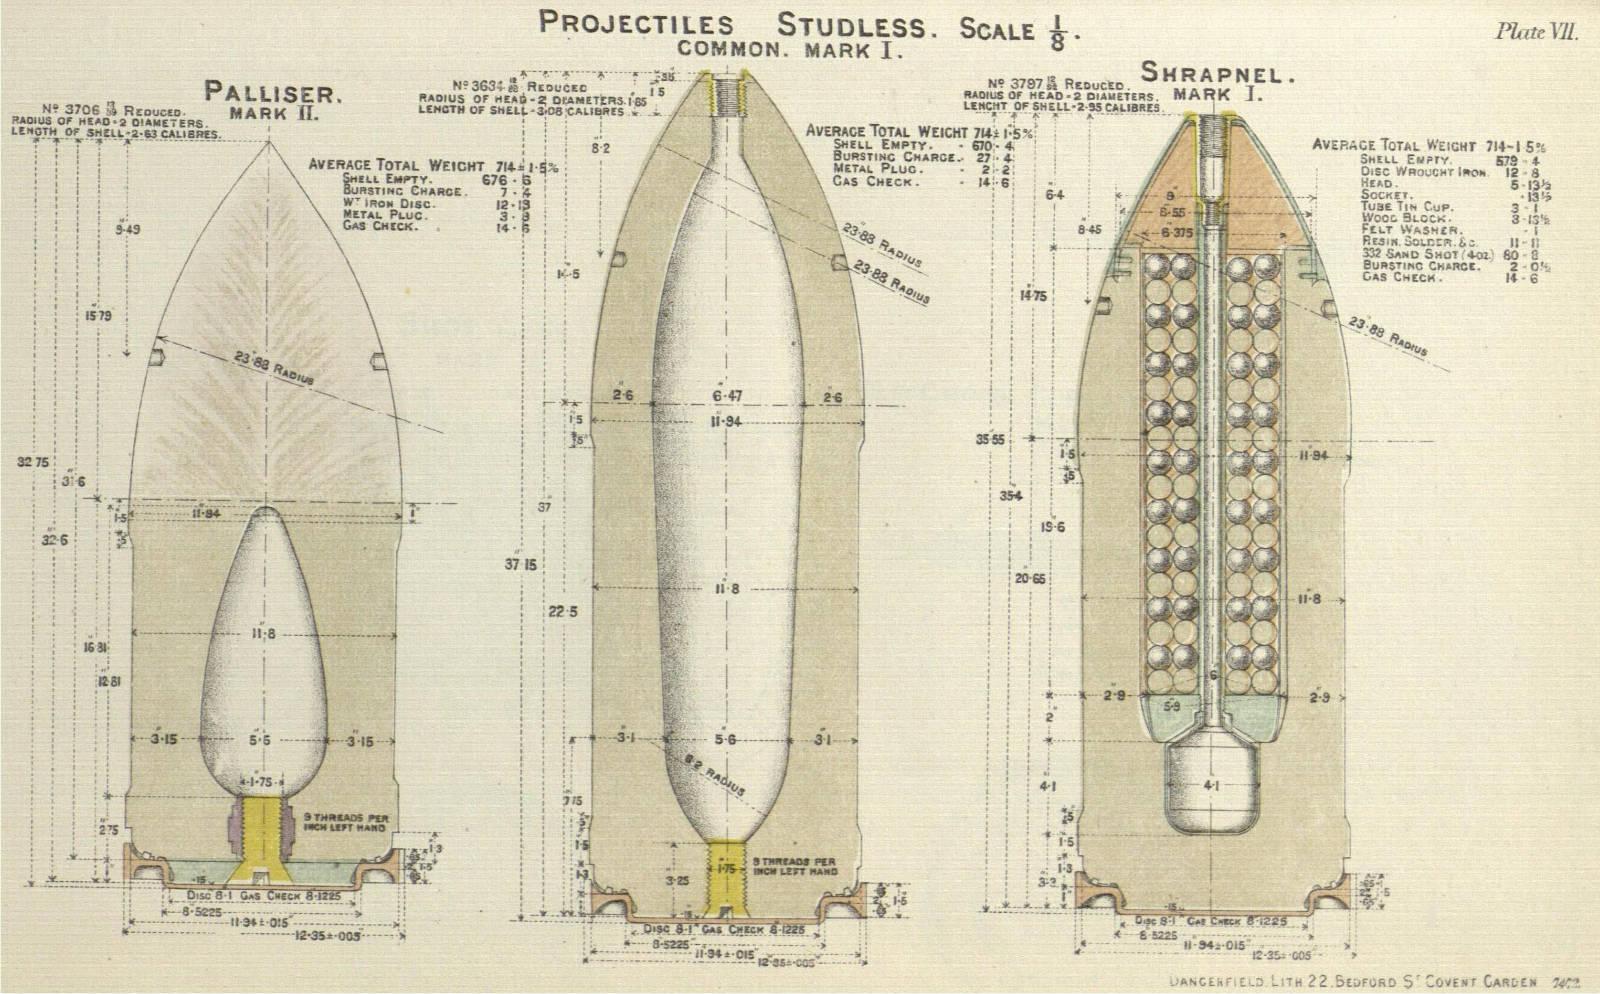 RML_12_inch_35_ton_gun_studless_projecti